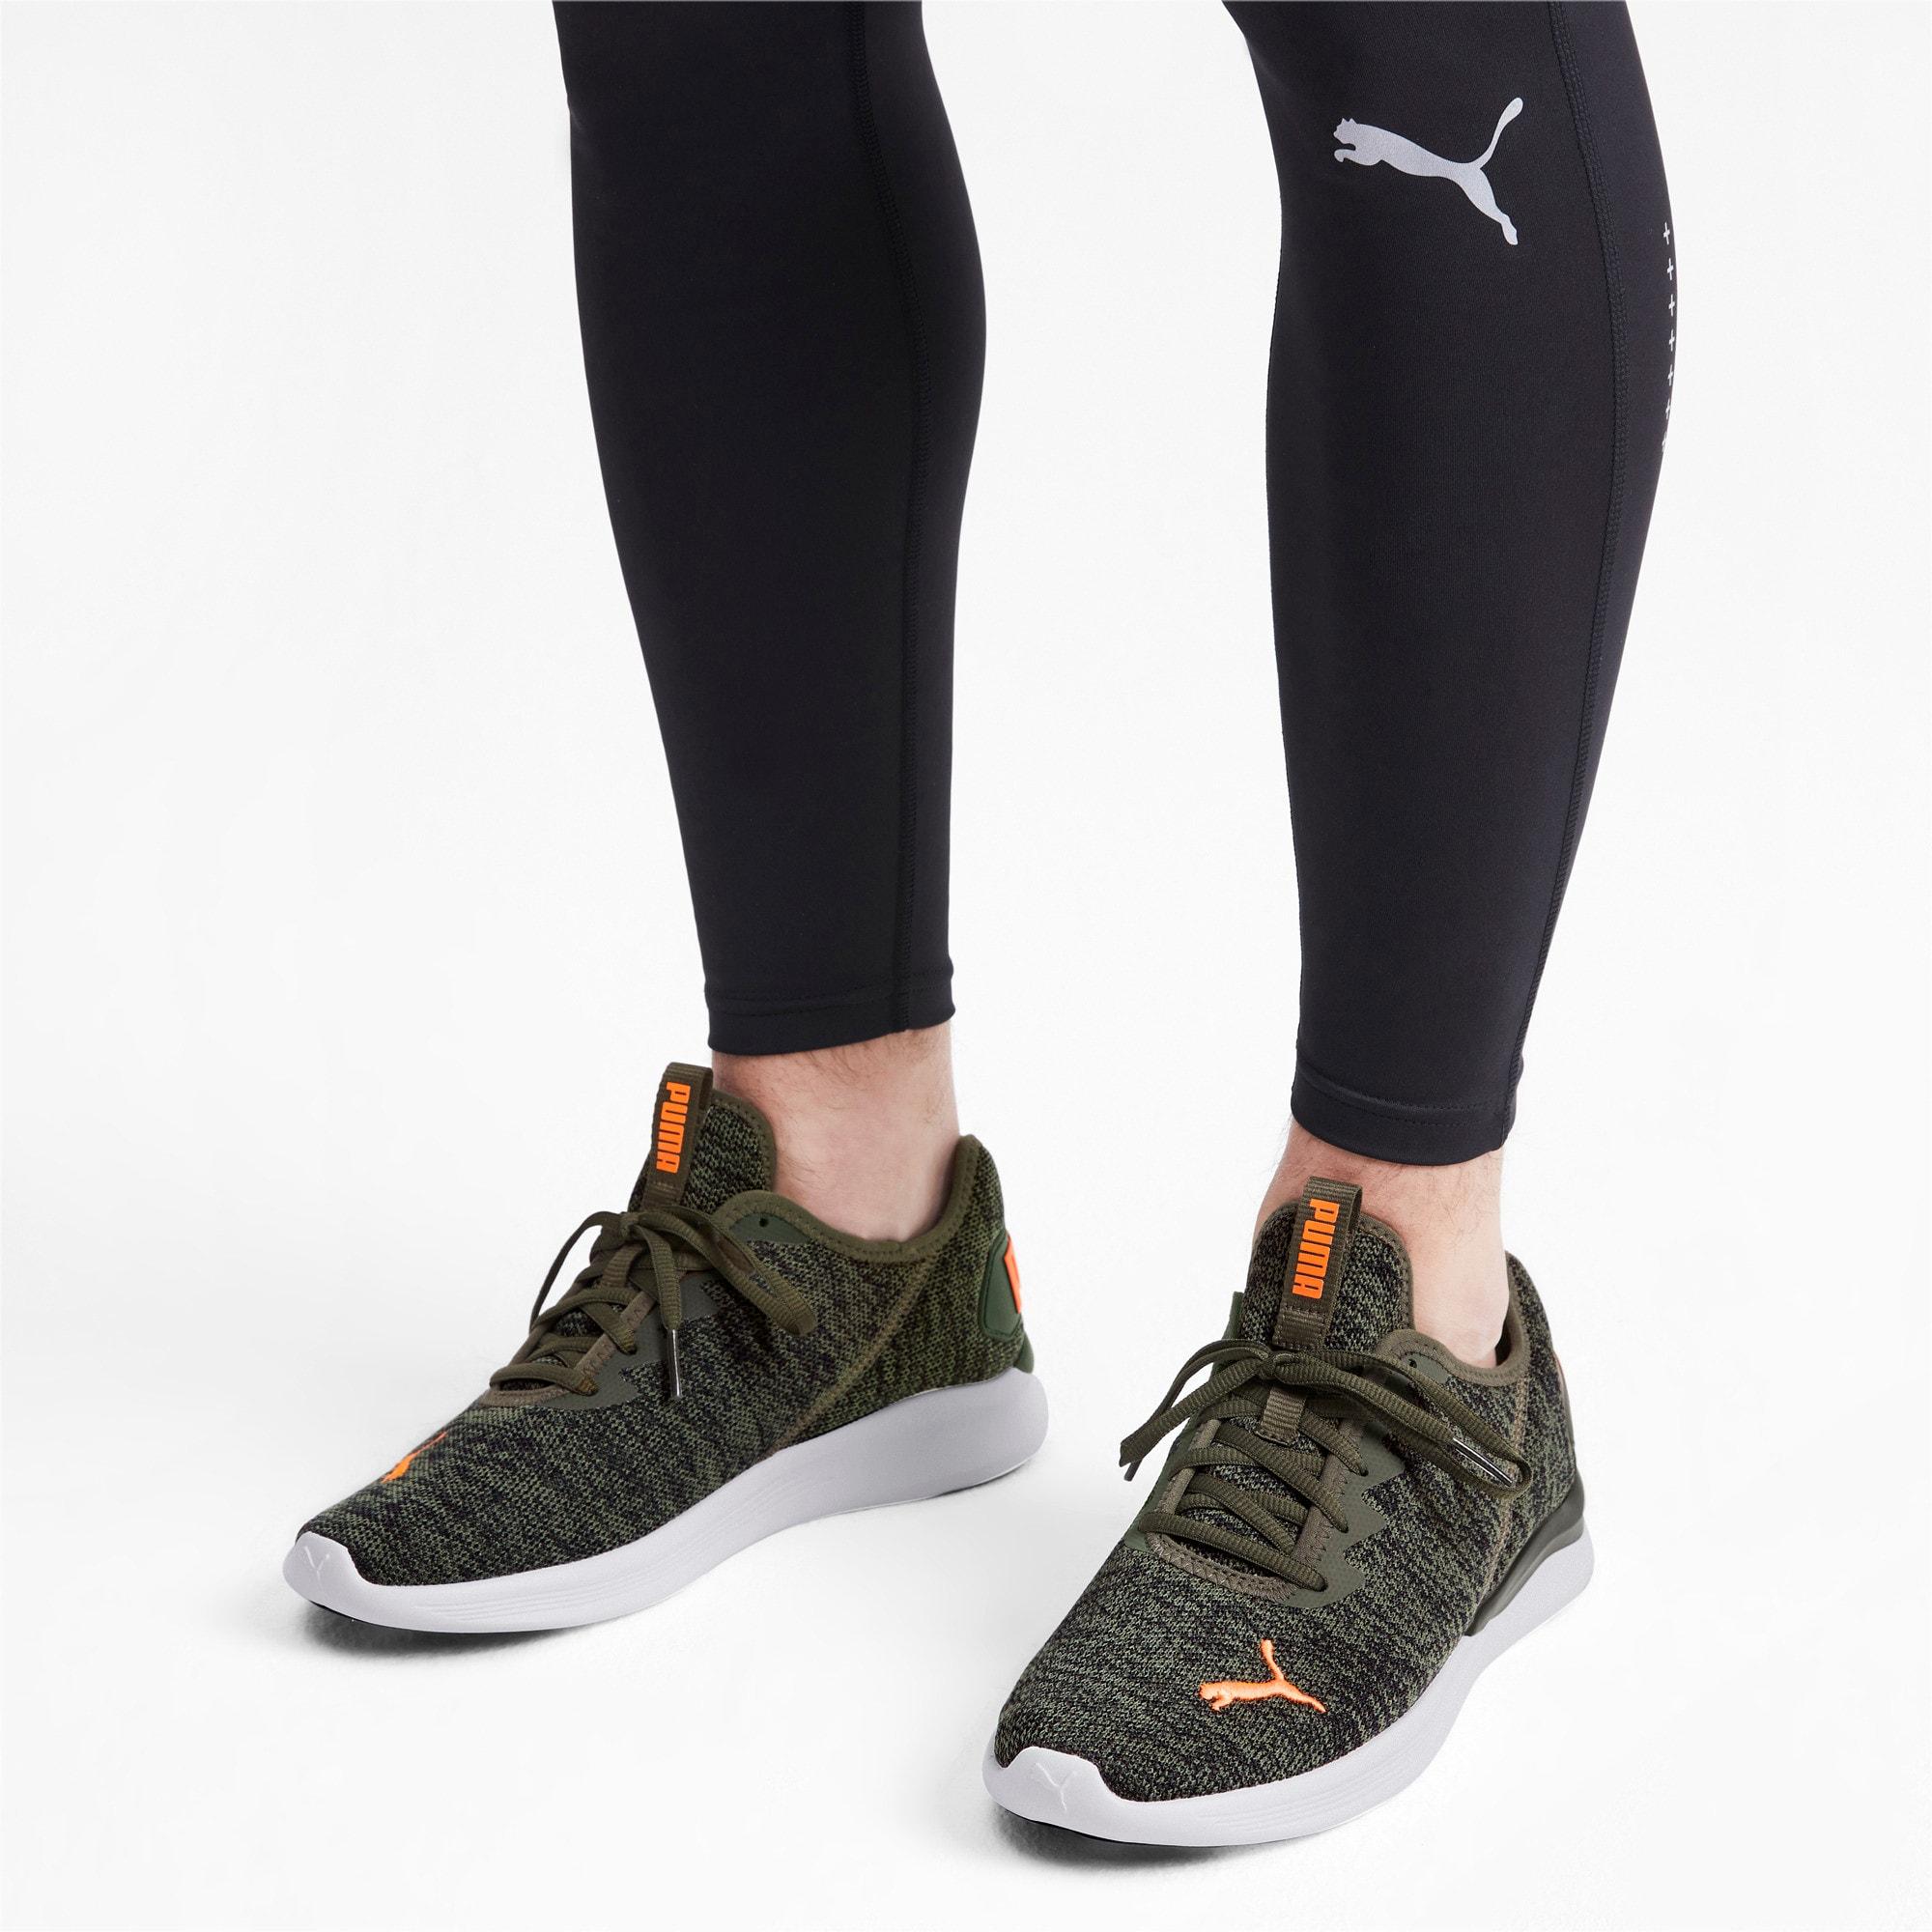 Thumbnail 3 of Ballast Men's Running Shoes, Forest Night-Black-Orange, medium-IND